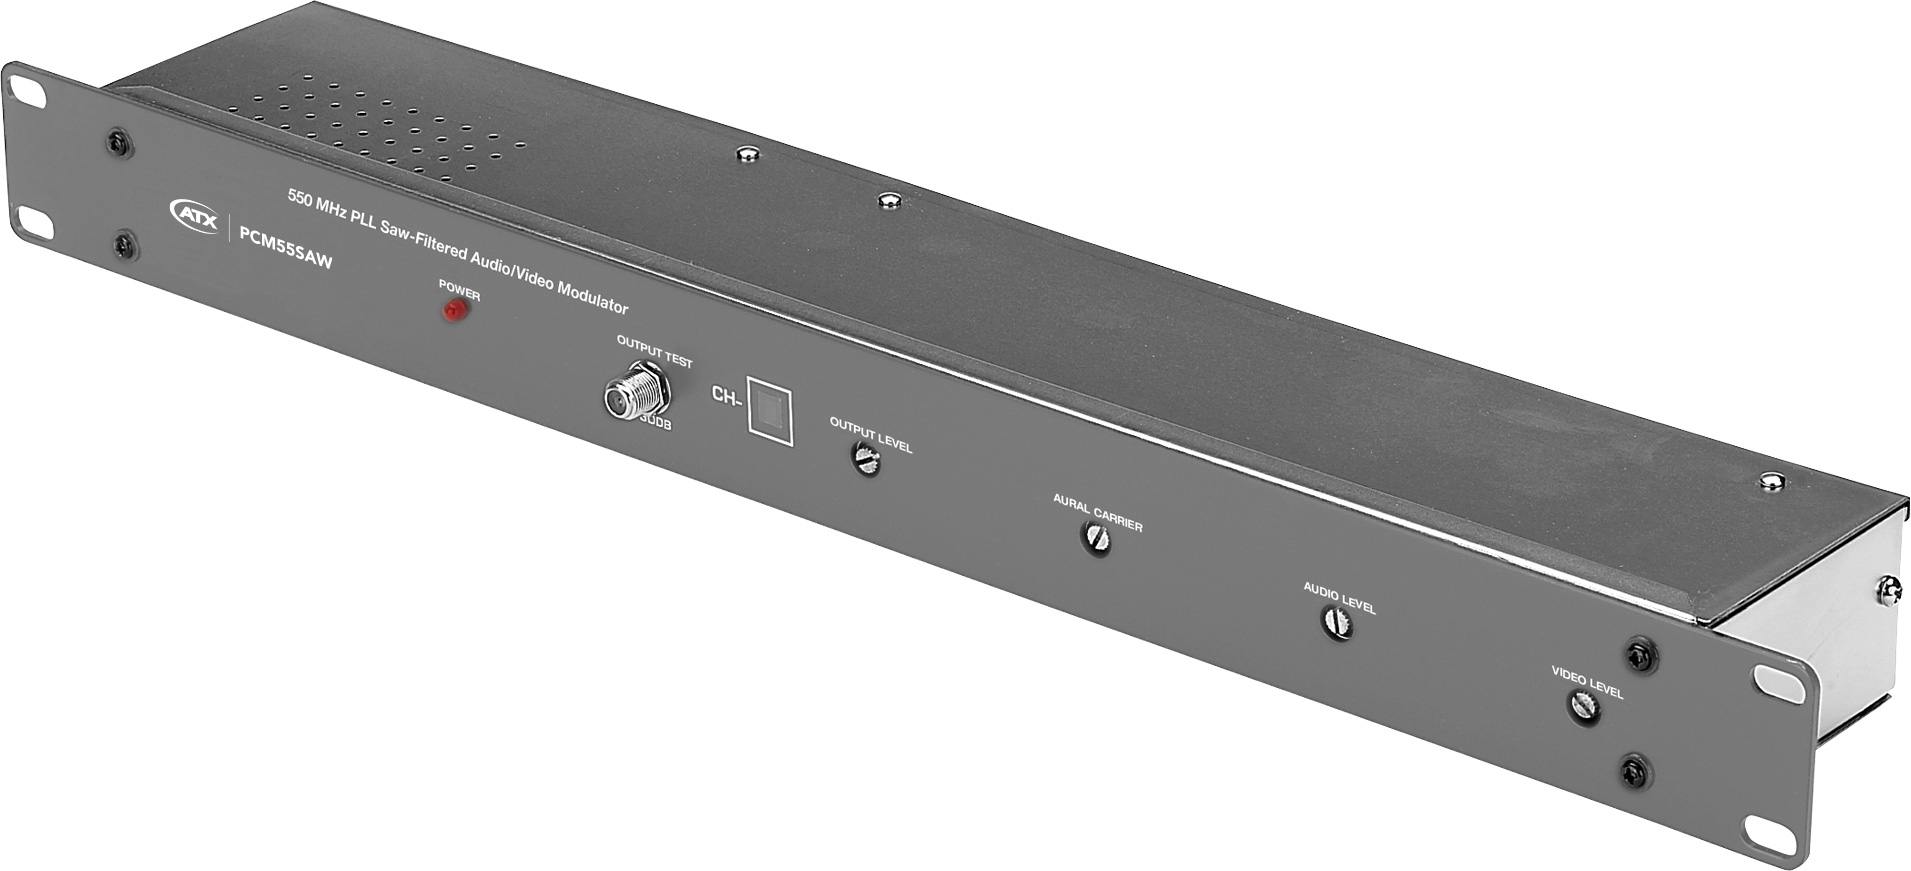 1 Channel Crystal A/V Modulator - Channel K PM-PCM55SAW-K